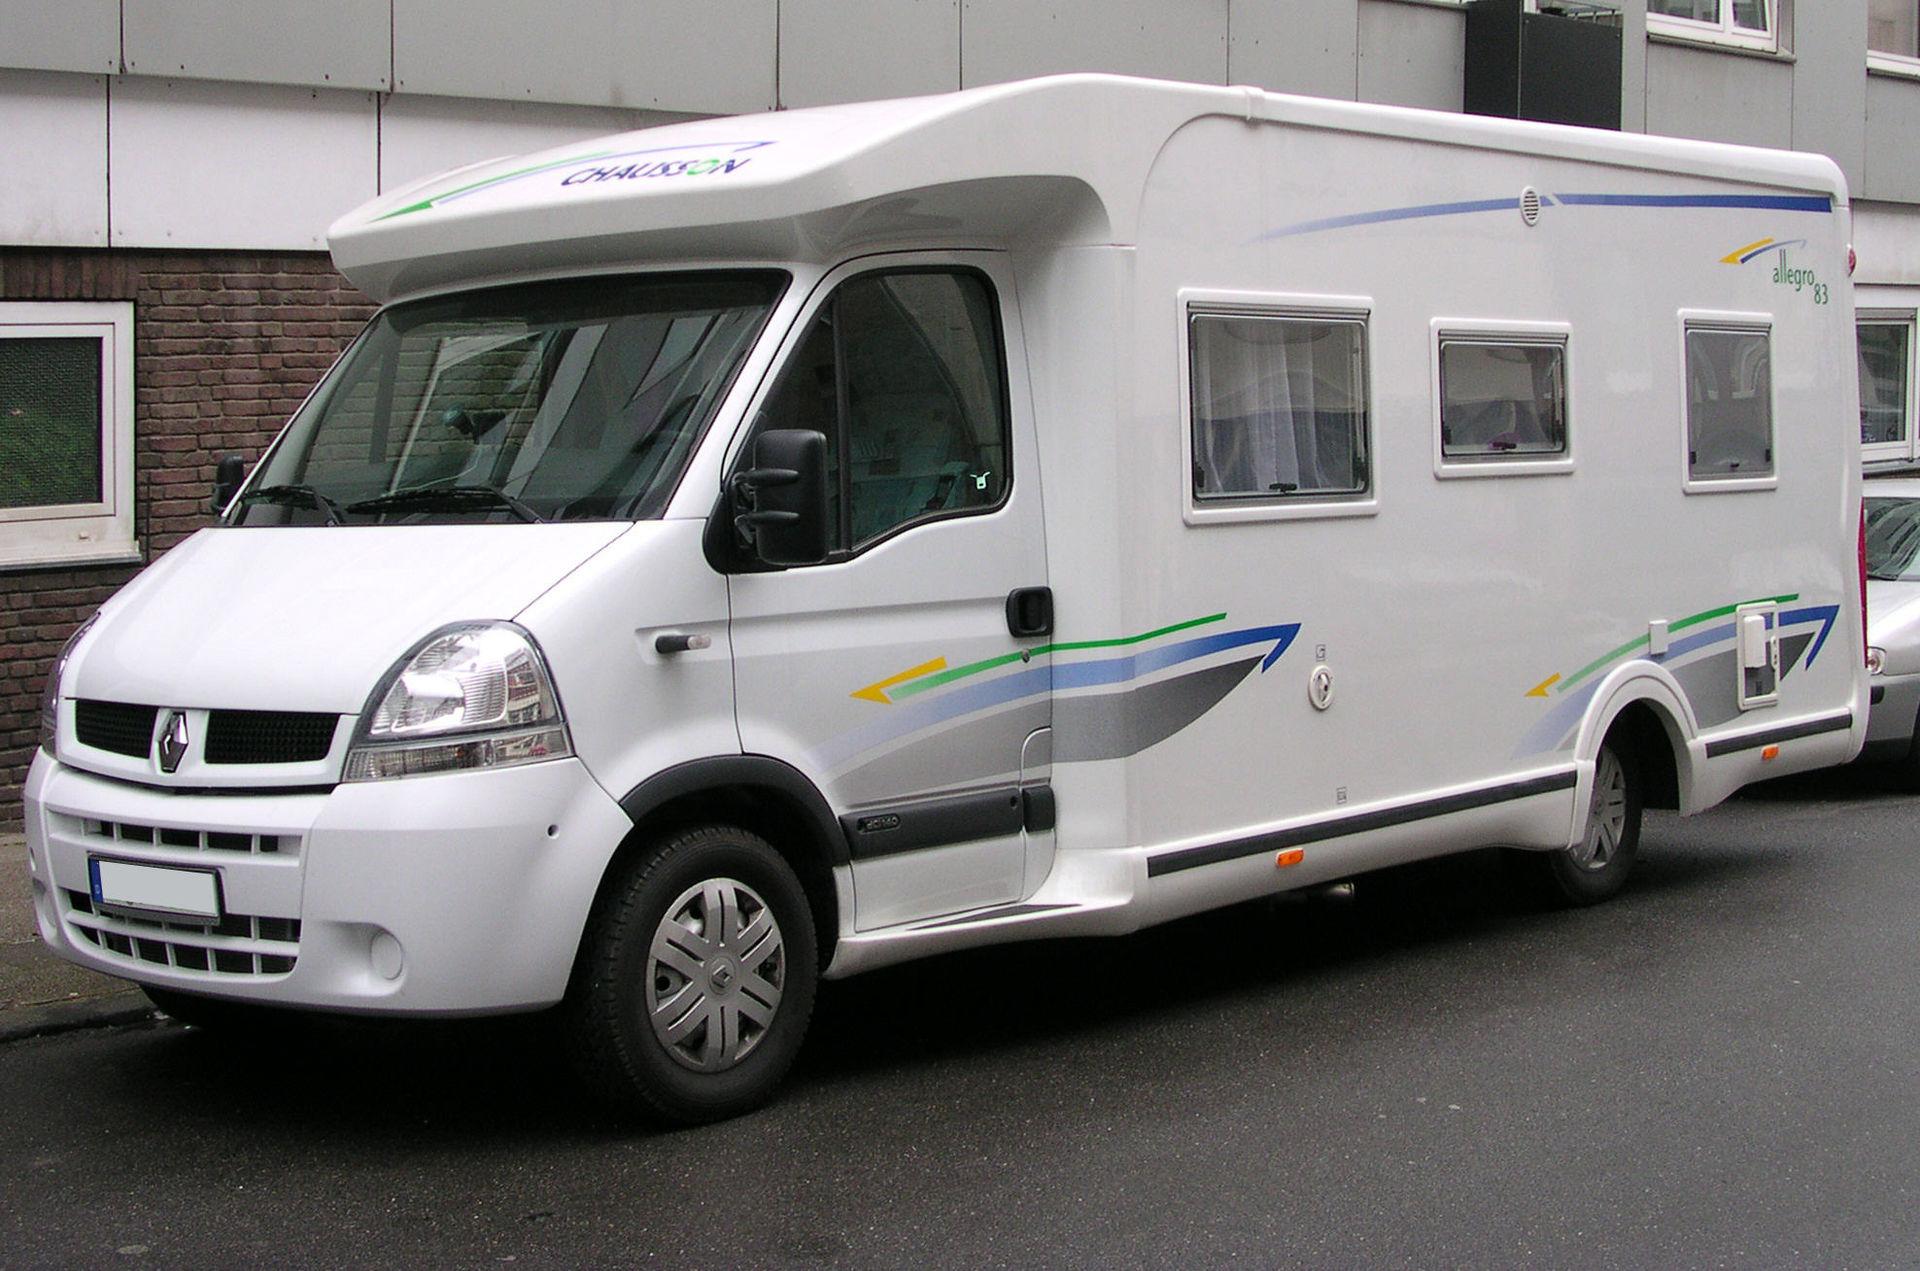 Concessionnaire Camping Car Vend Ea A D